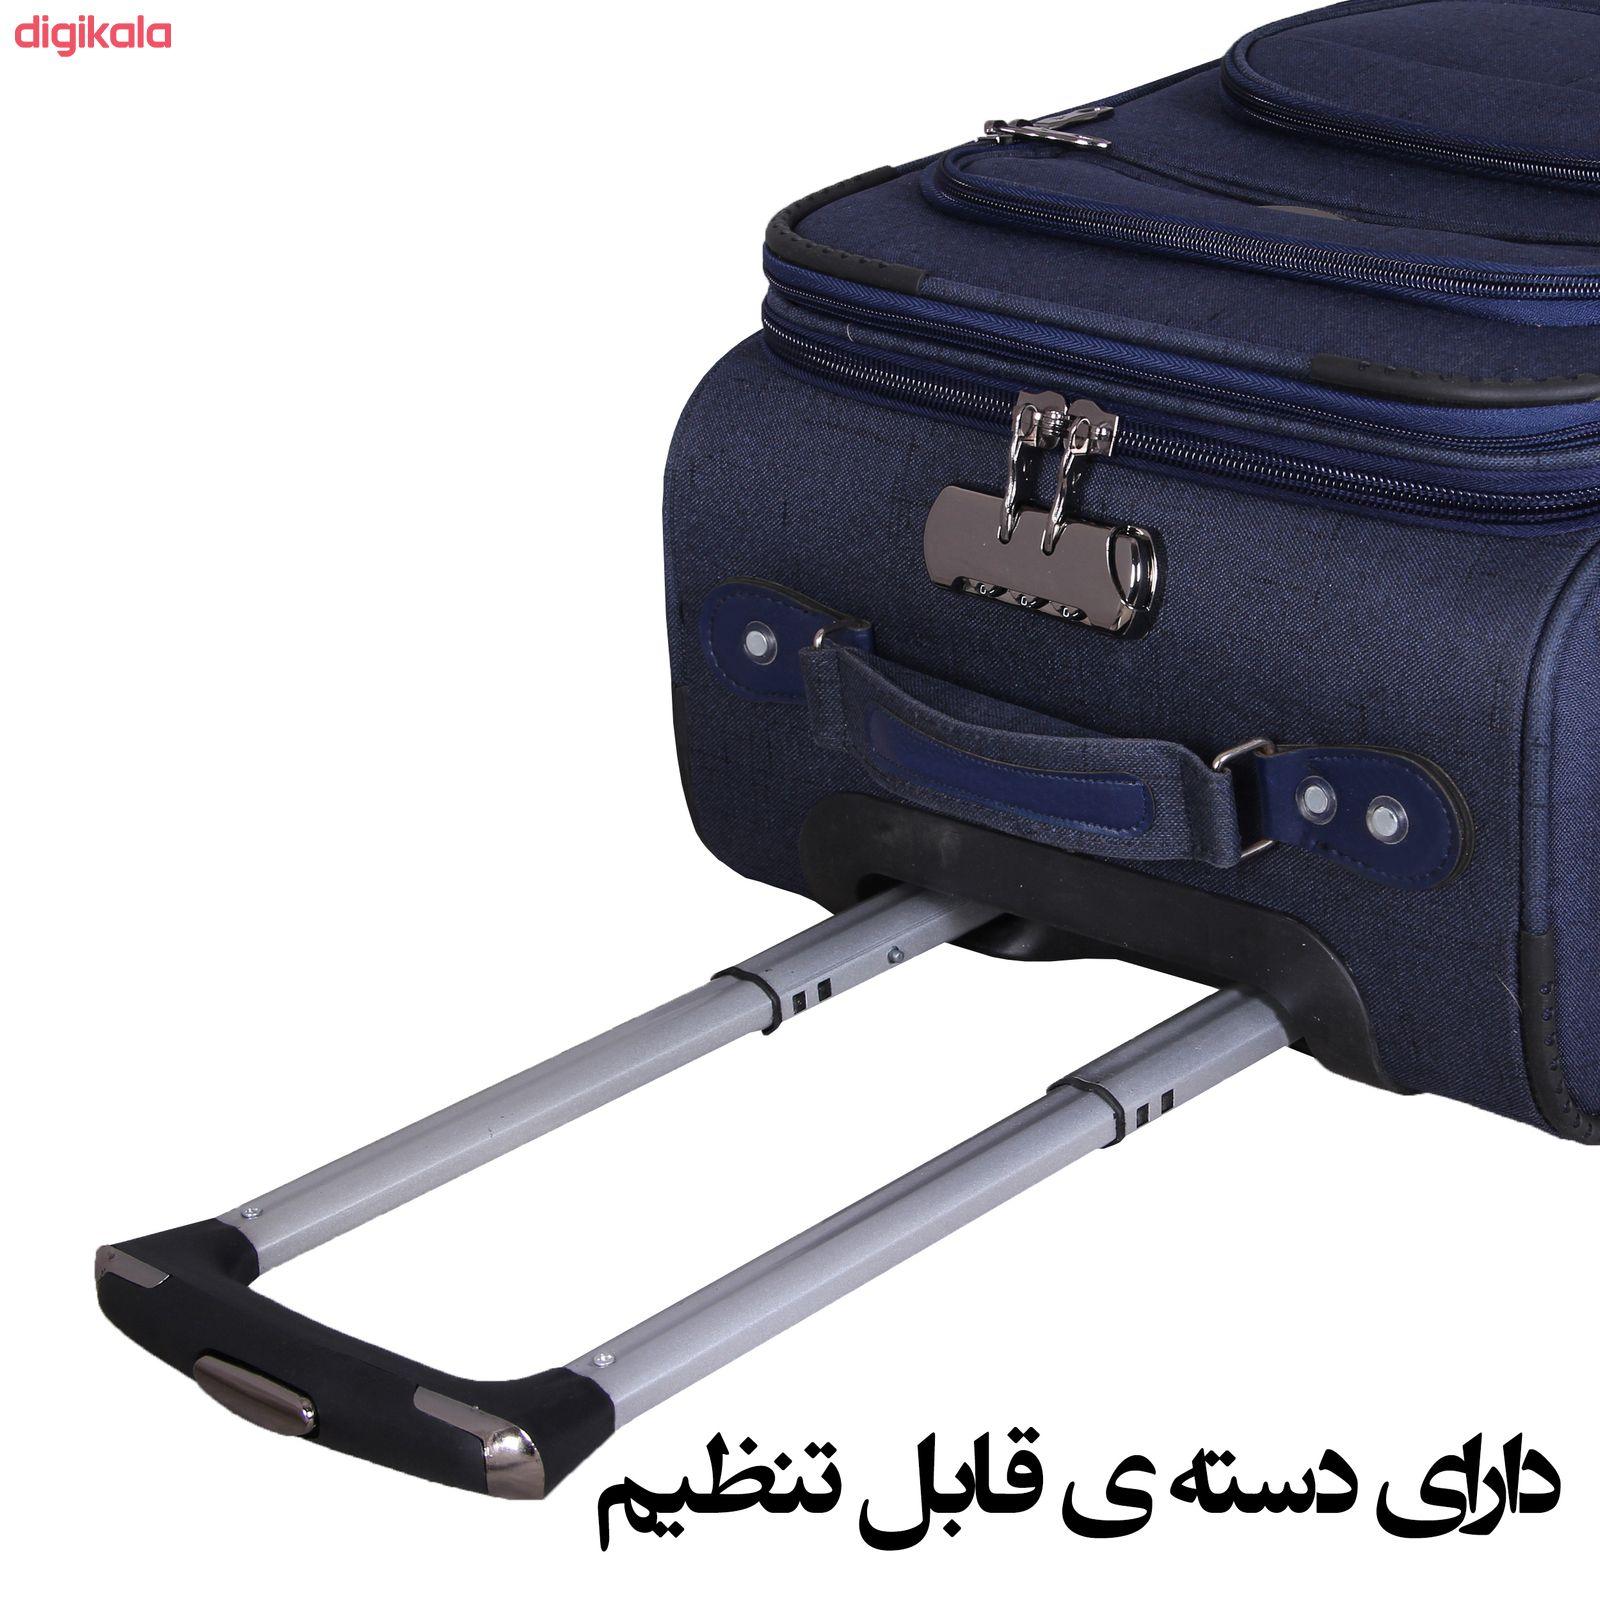 مجموعه سه عددی چمدان کد 2301A main 1 7